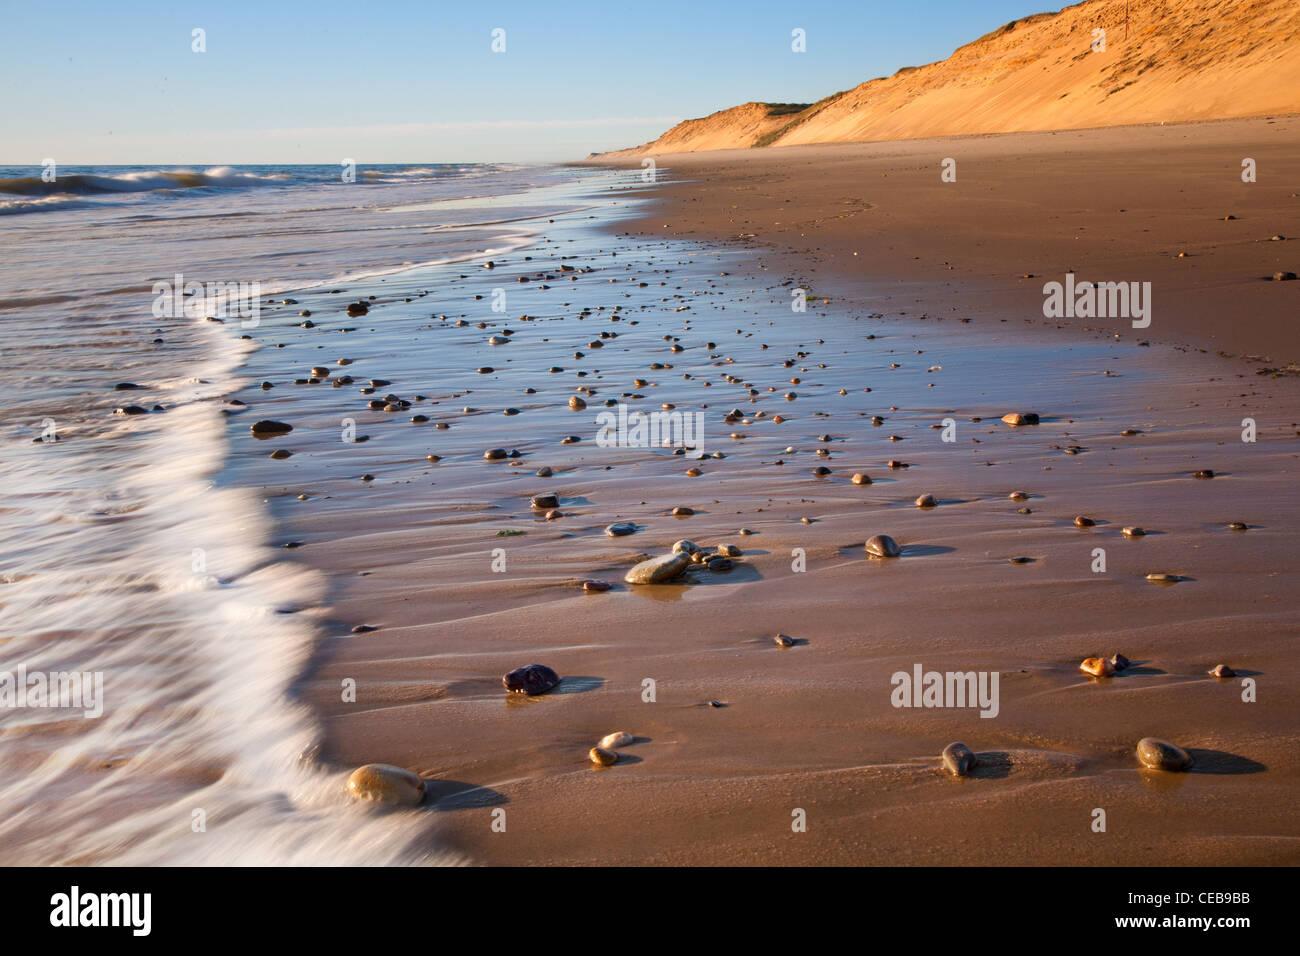 Ola de lava sobre pequeñas rocas en Playa Marconi, Wellfleet Imagen De Stock